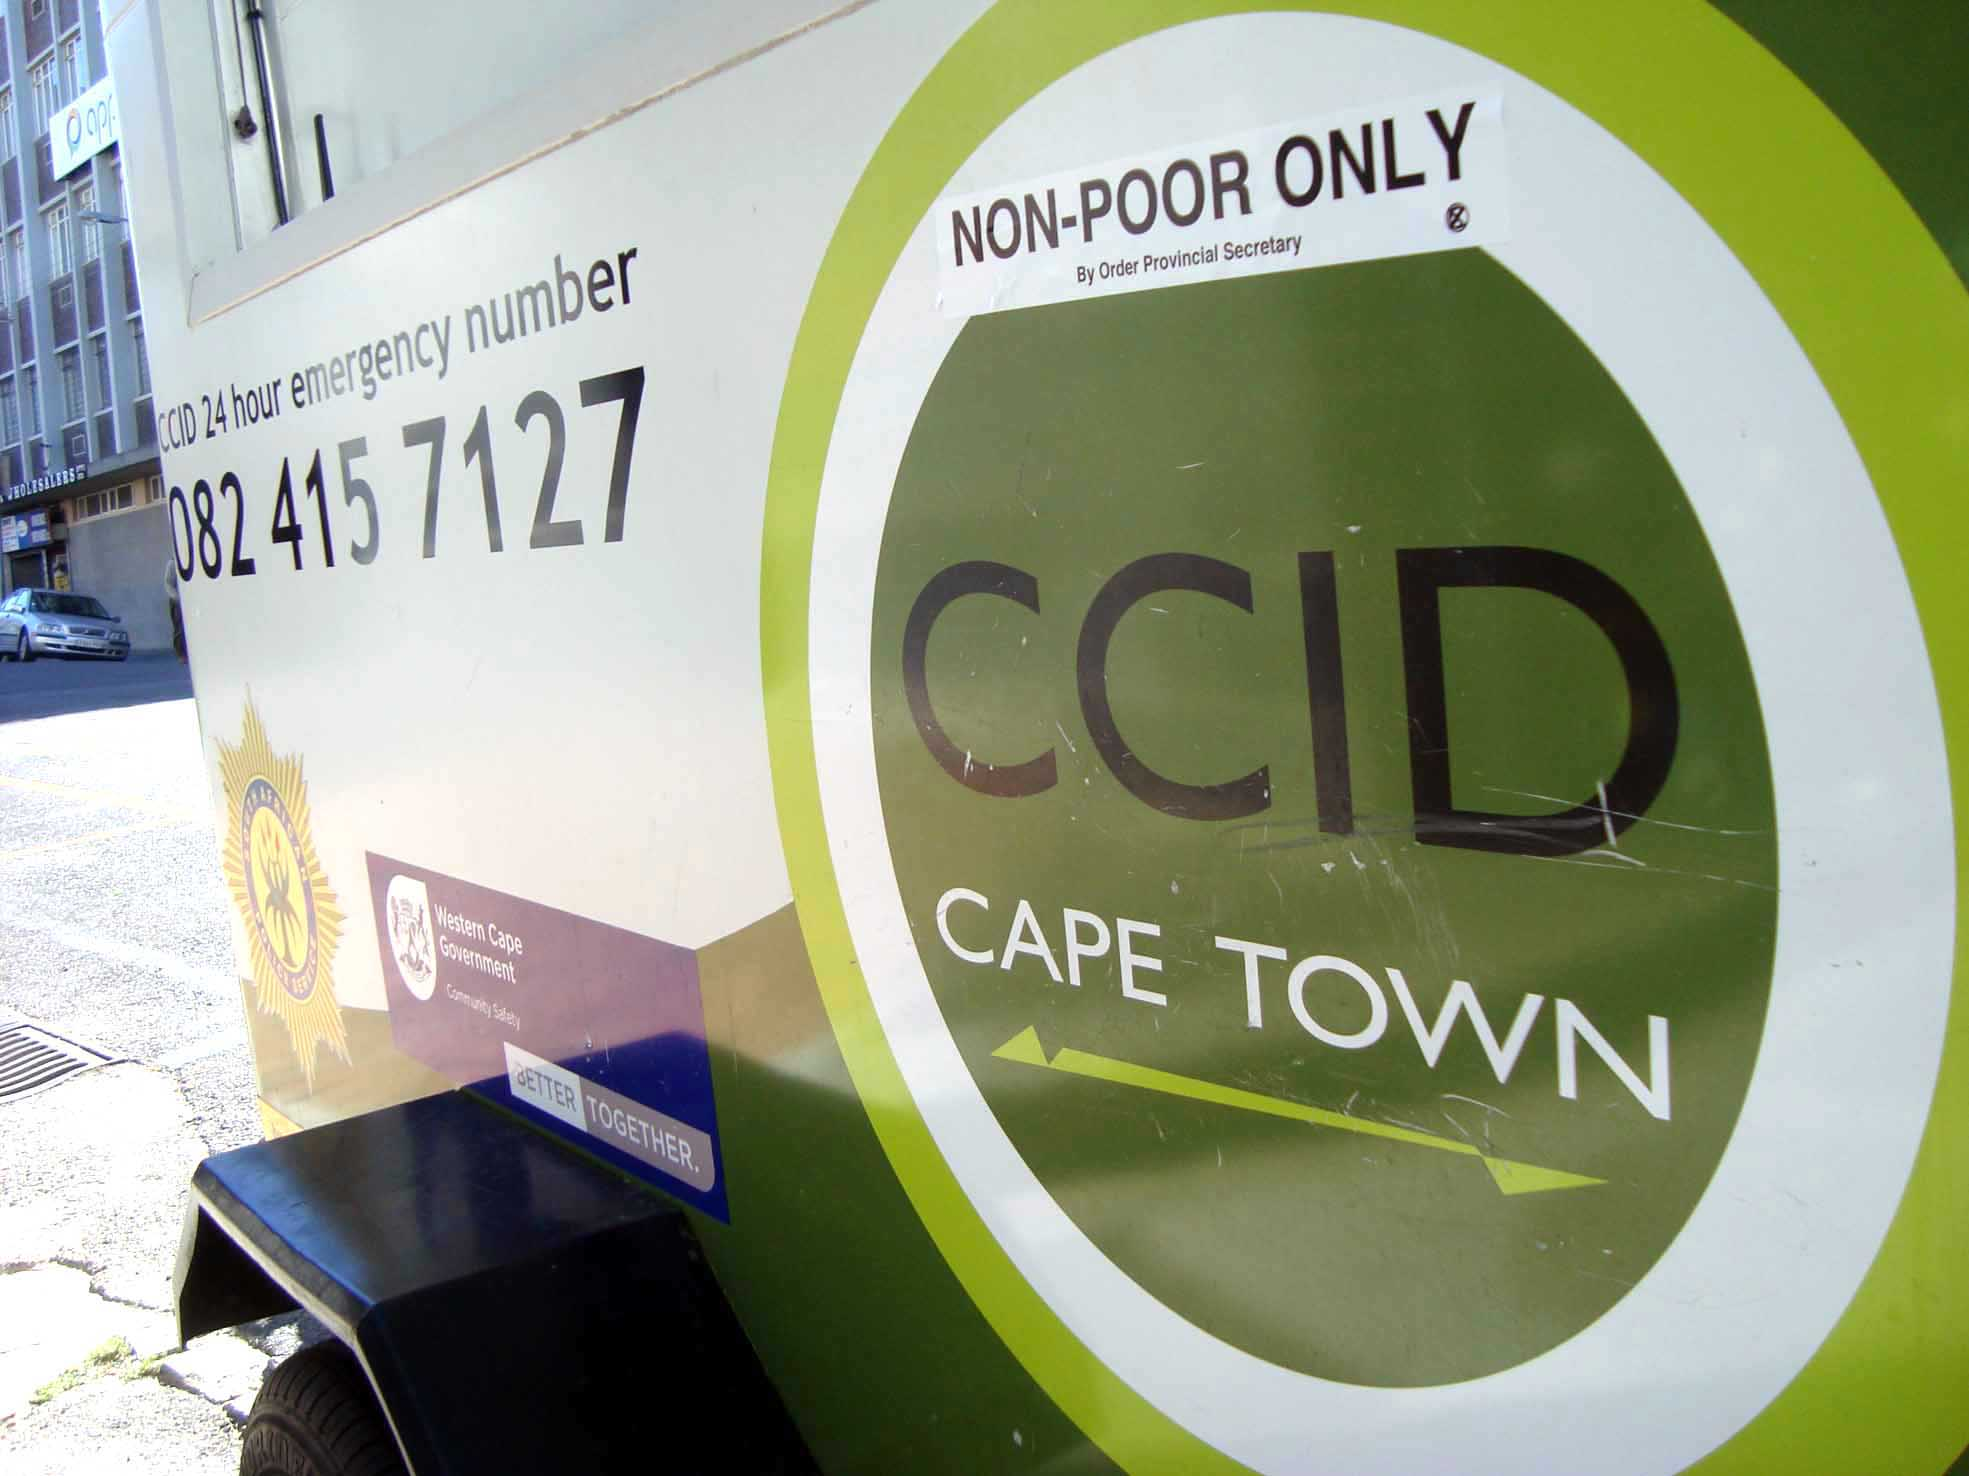 City Partnership Cape Town The Cape Town Partnership